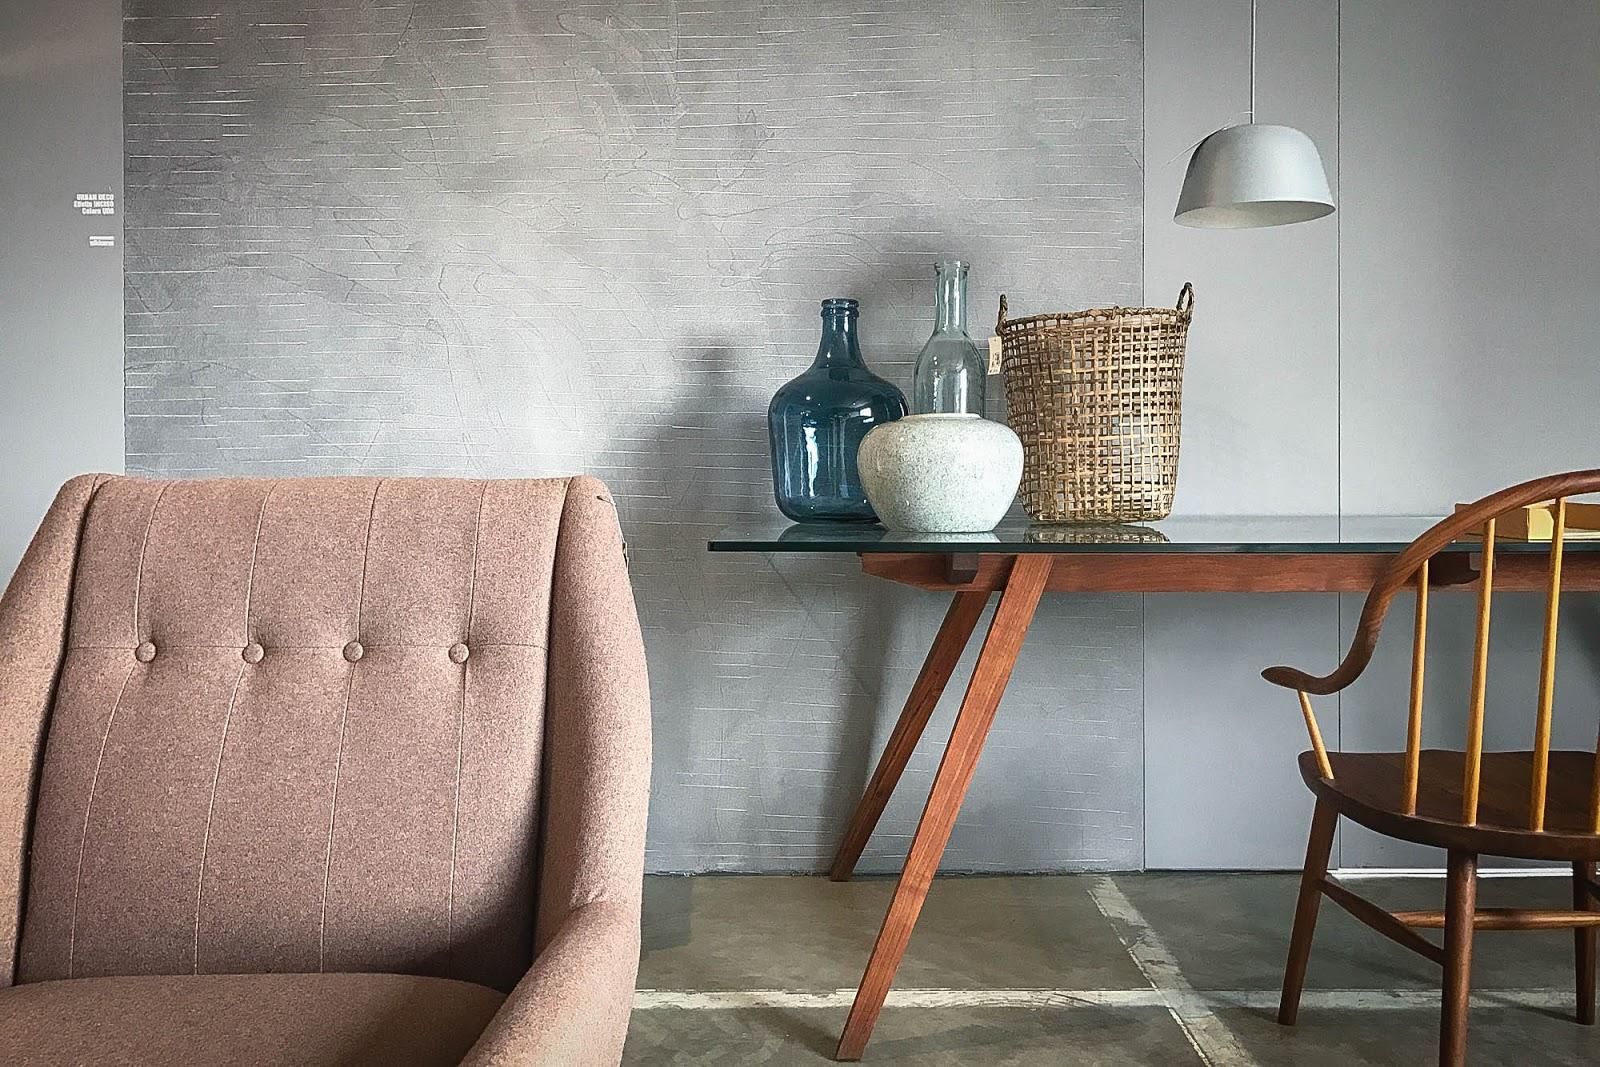 Pittura Pareti Shabby Chic : Pareti effetto cemento con sikkens shabby chic interiors